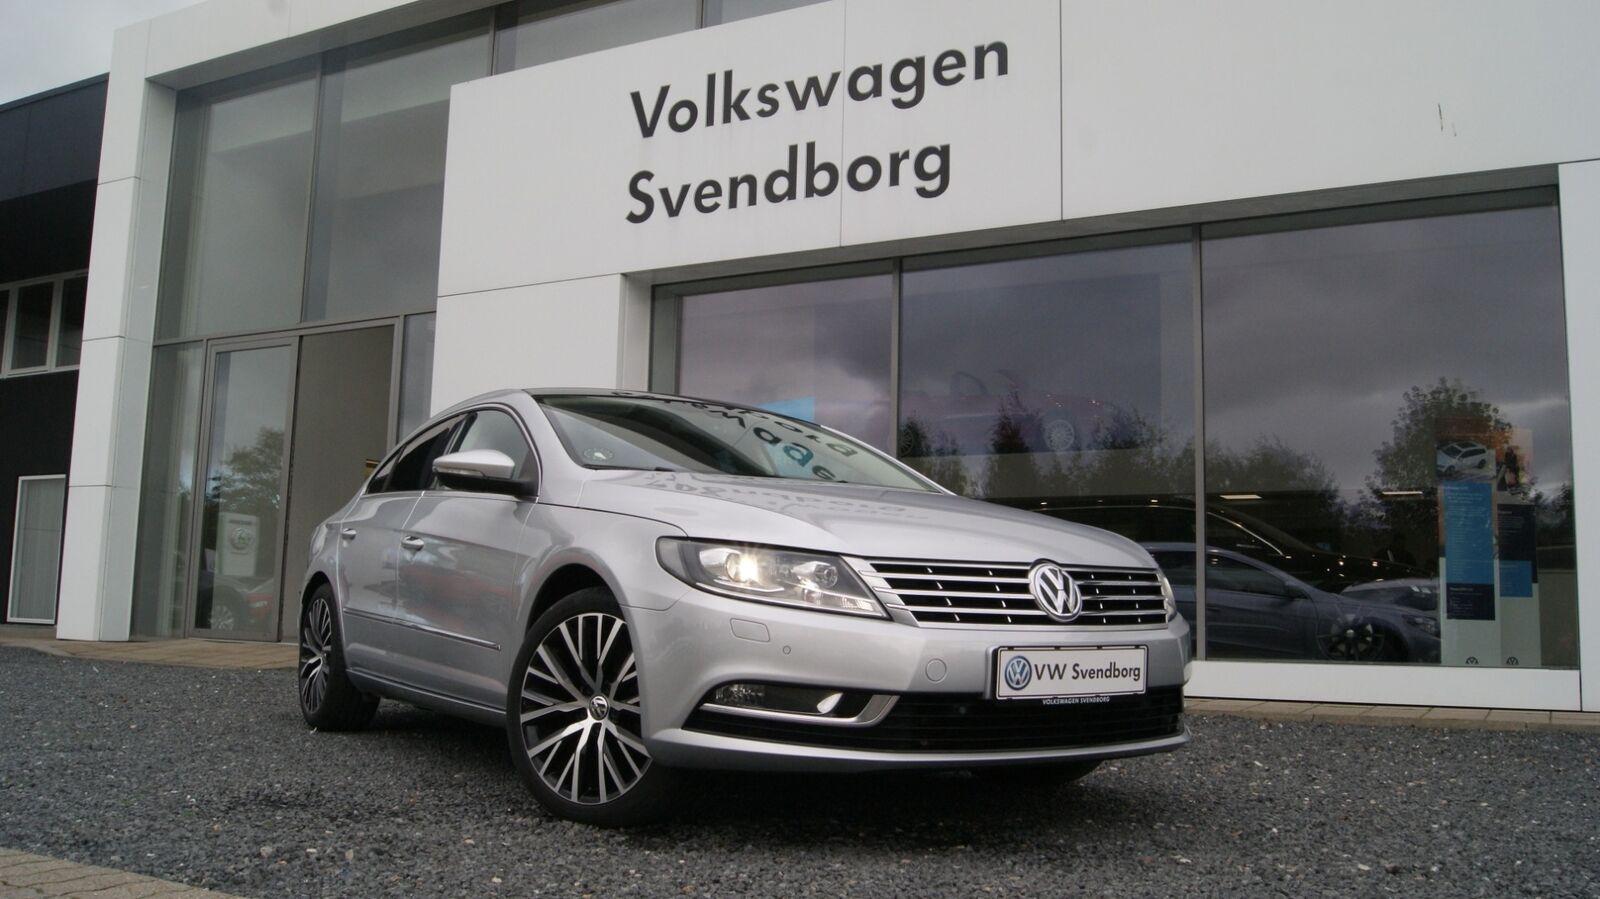 VW CC 2,0 TDi 140 DSG BMT 4d - 249.800 kr.